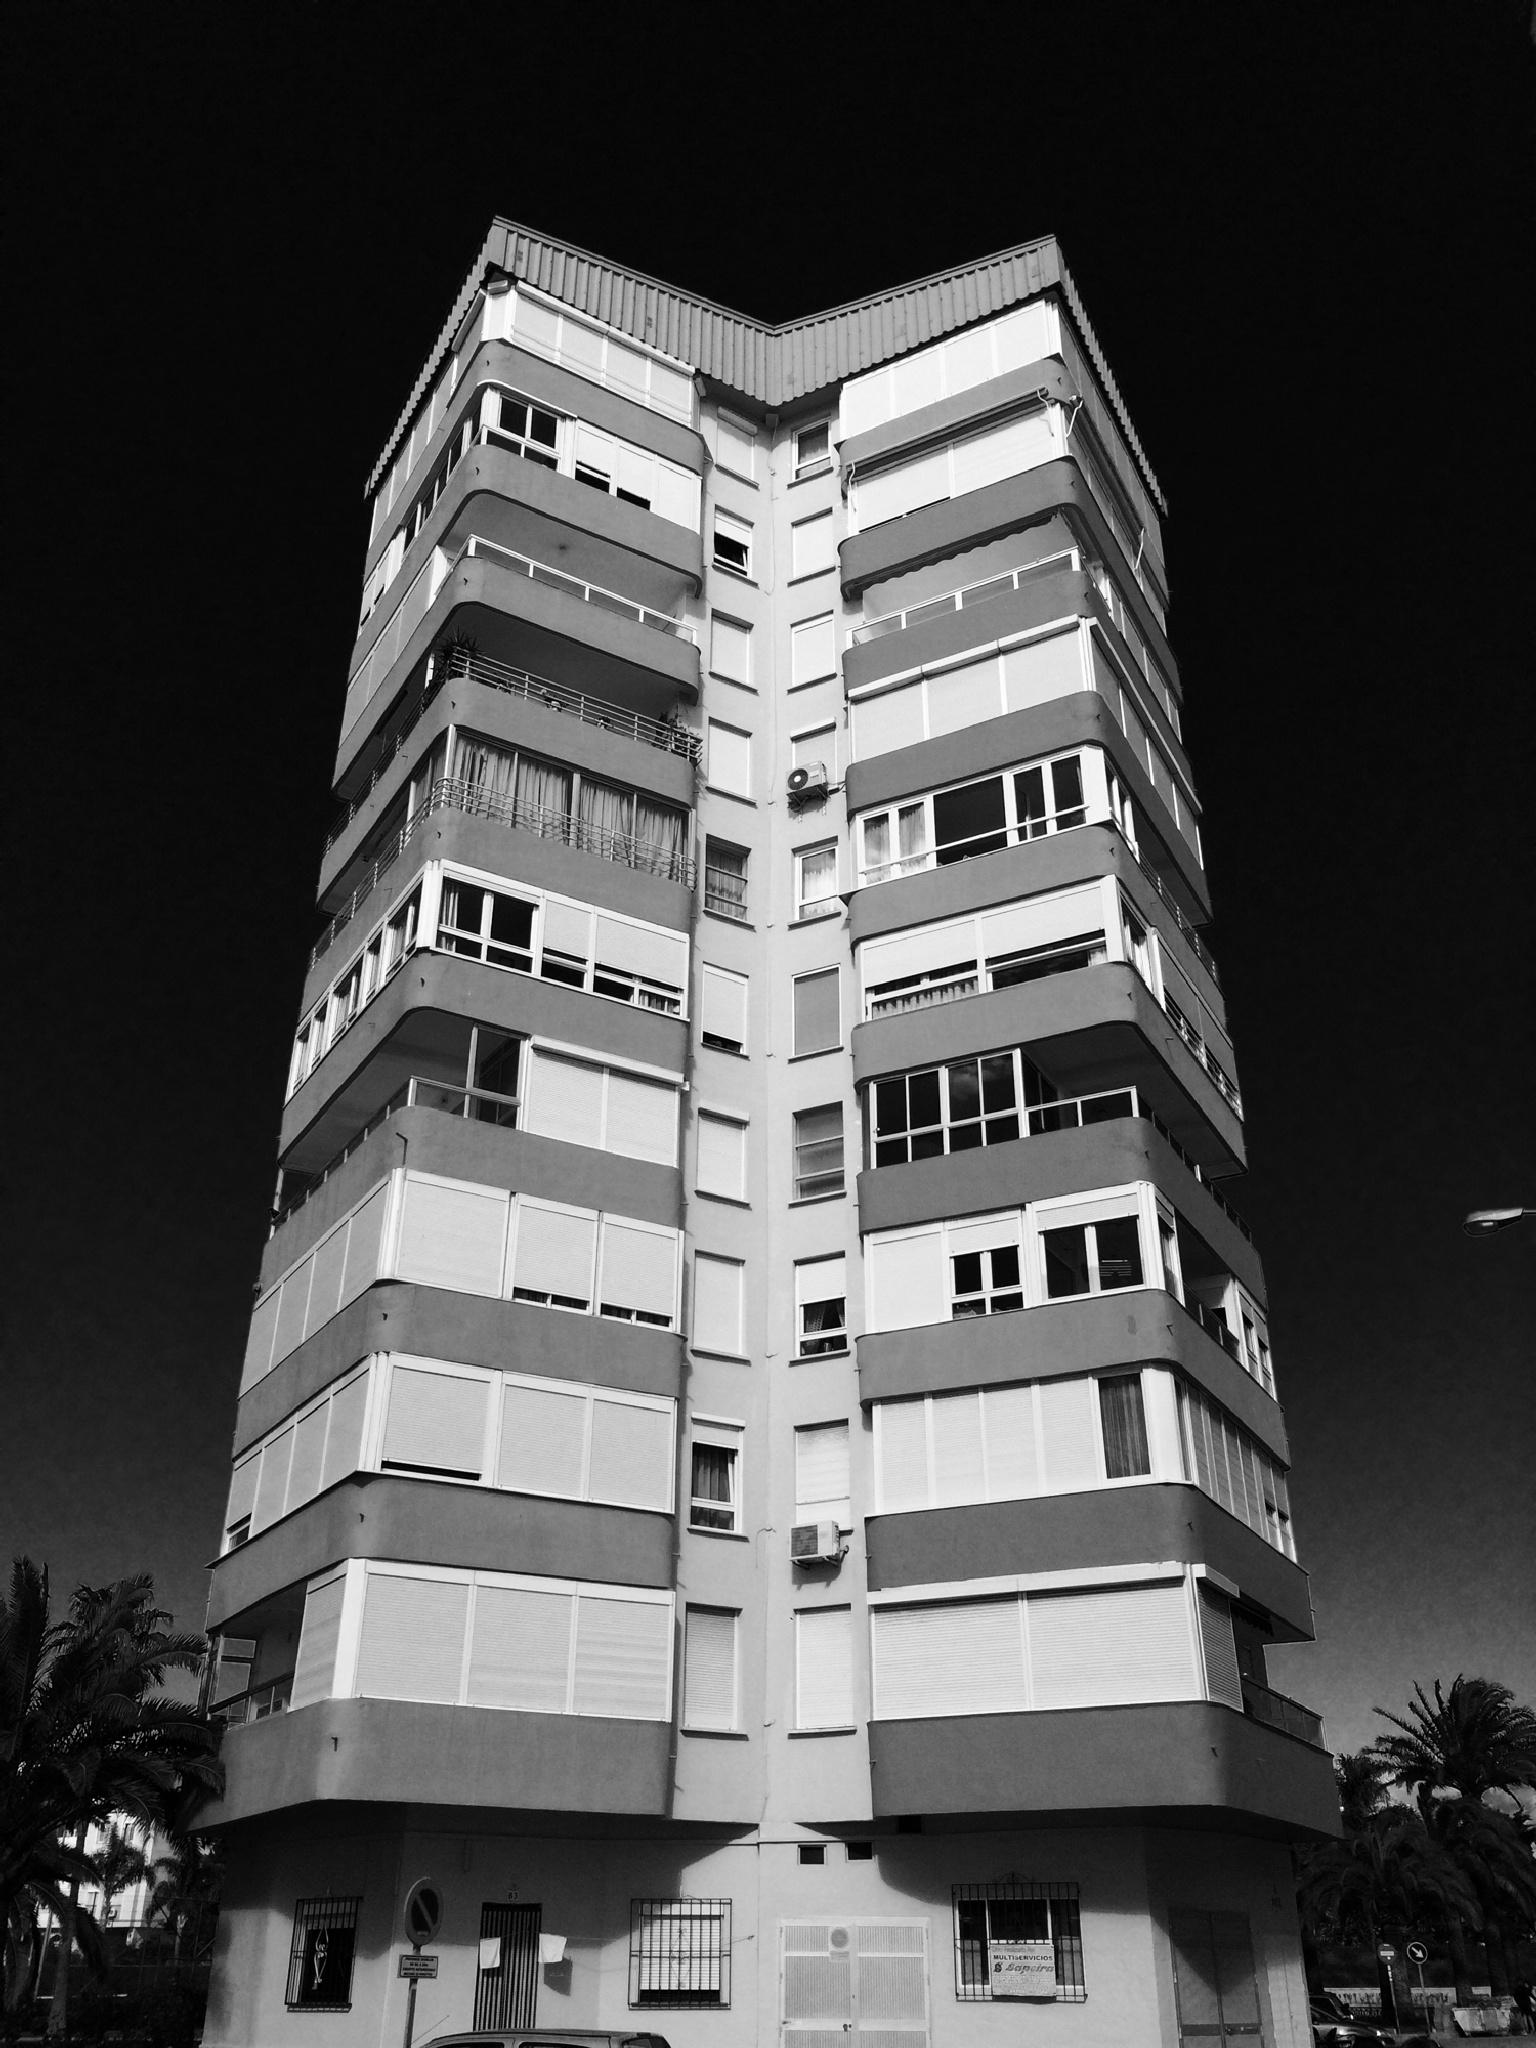 Tower block by Paul Edward Marshall